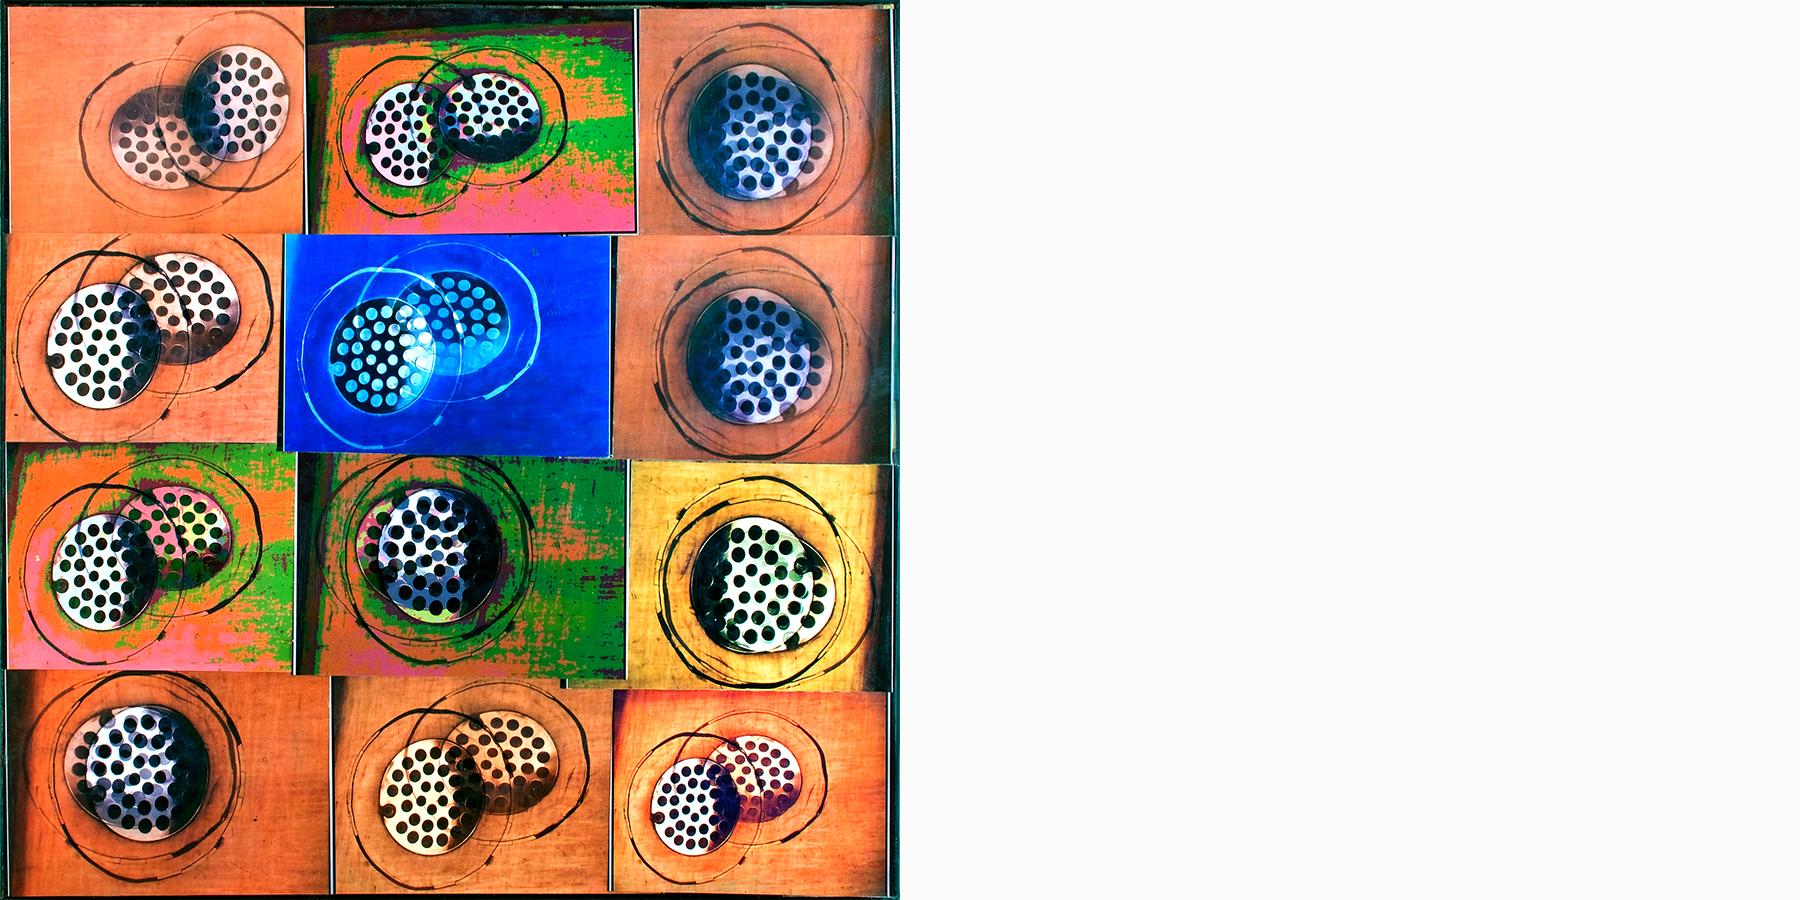 Deborah Cahn,     Floor Drain in the Women's Restroom at the Couger Mountain Zoo  ,   collage, 2014